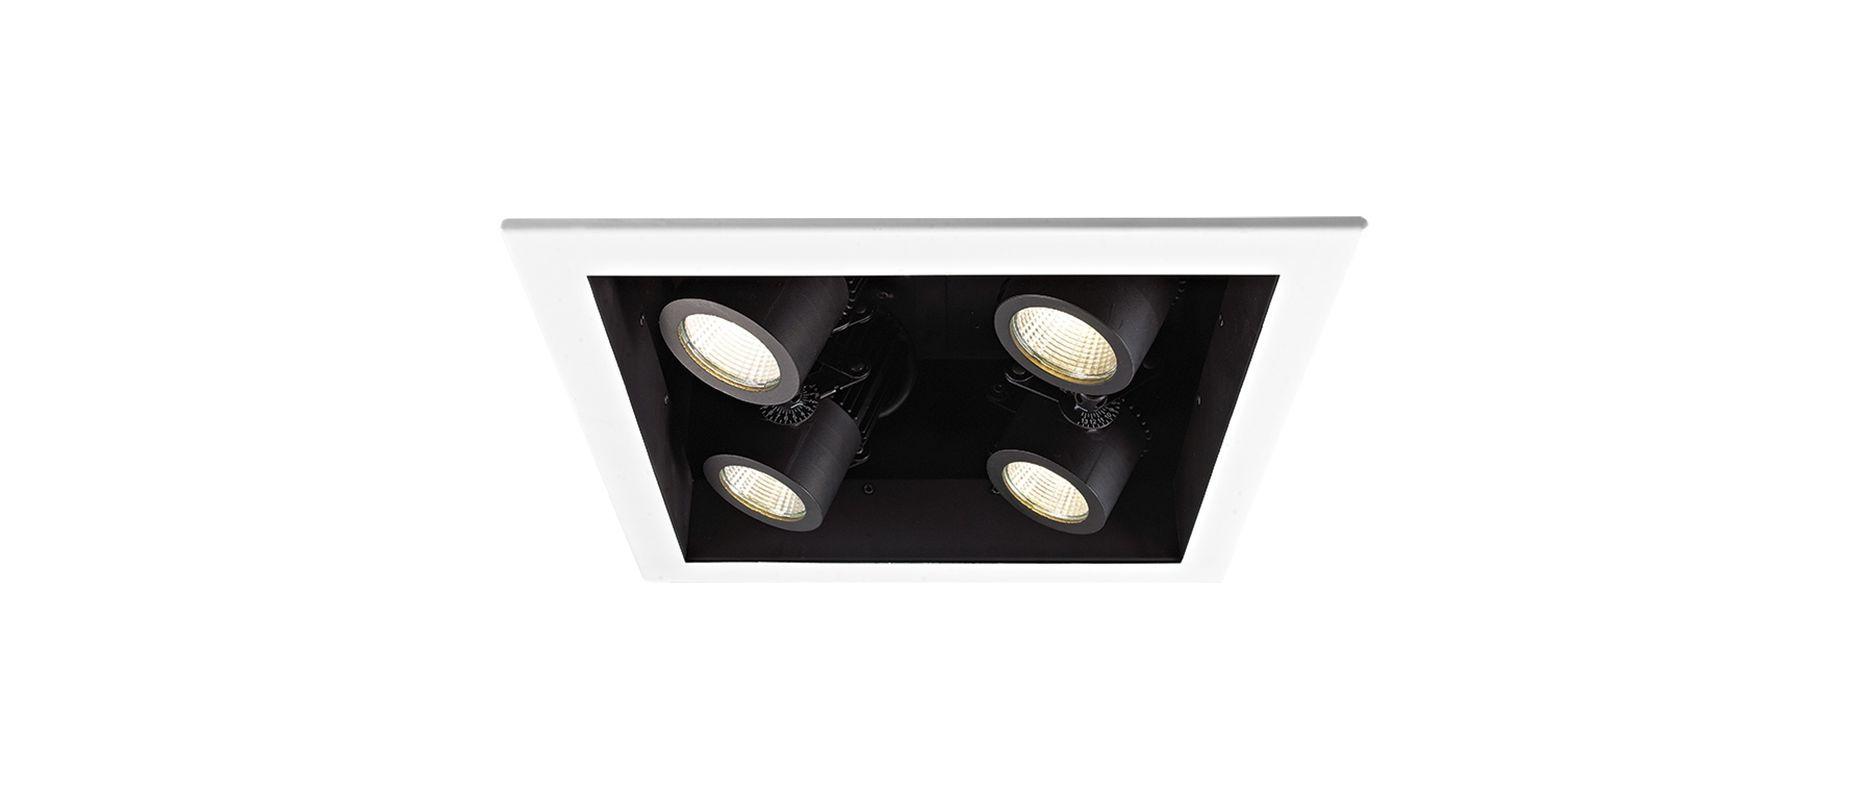 WAC Lighting MT-4LD226N-S930 4 Light Energy Star 3000K High Output LED